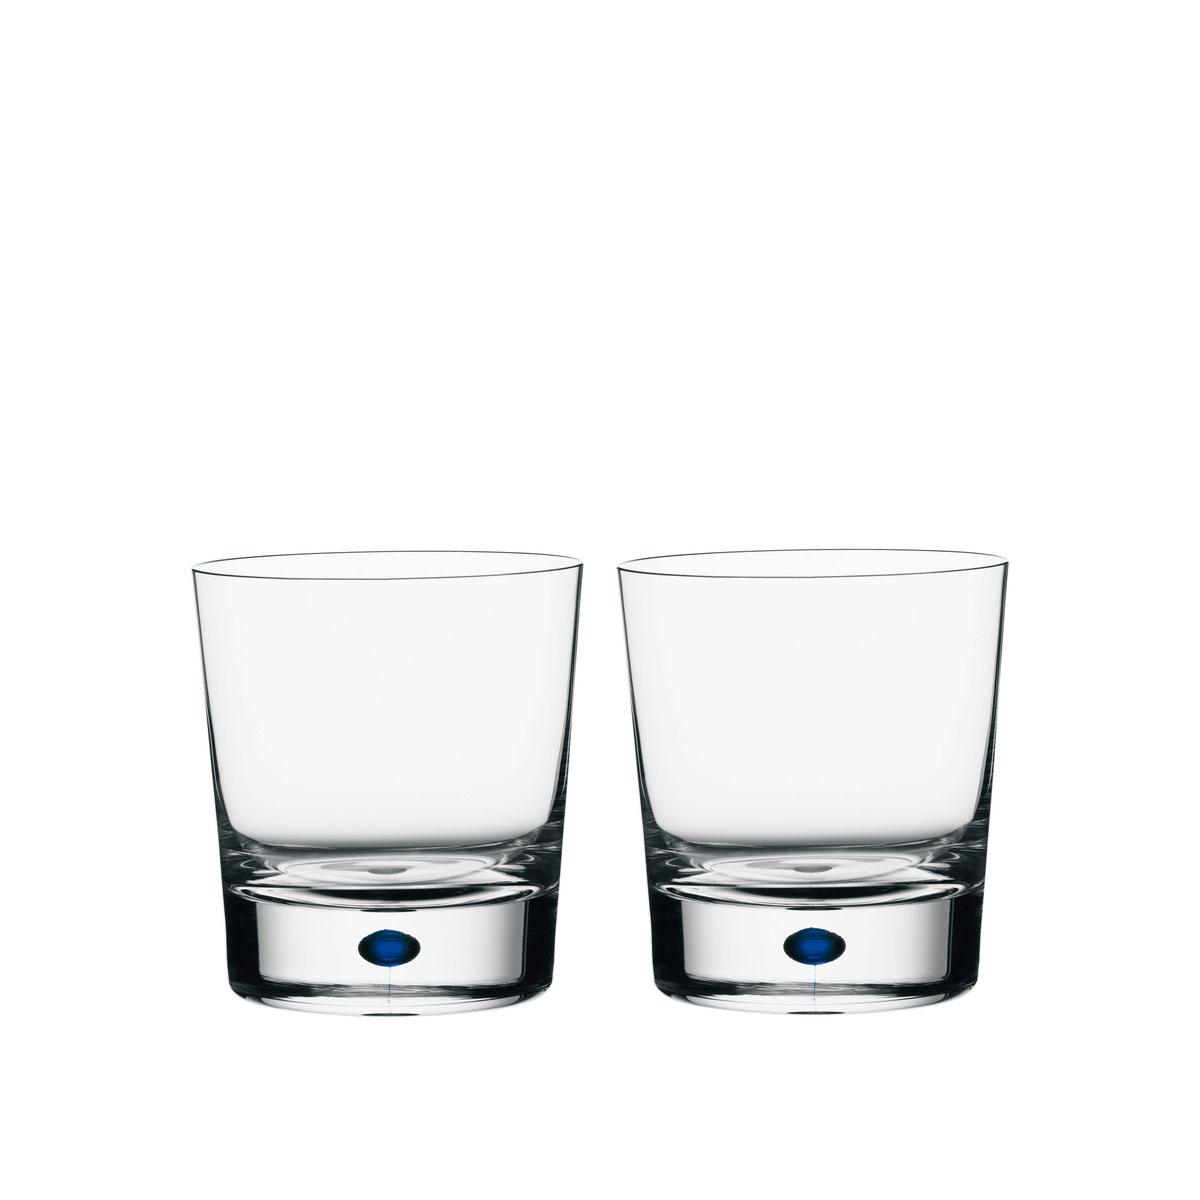 Orrefors Crystal, Intermezzo Blue Crystal DOF Tumbler, Pair